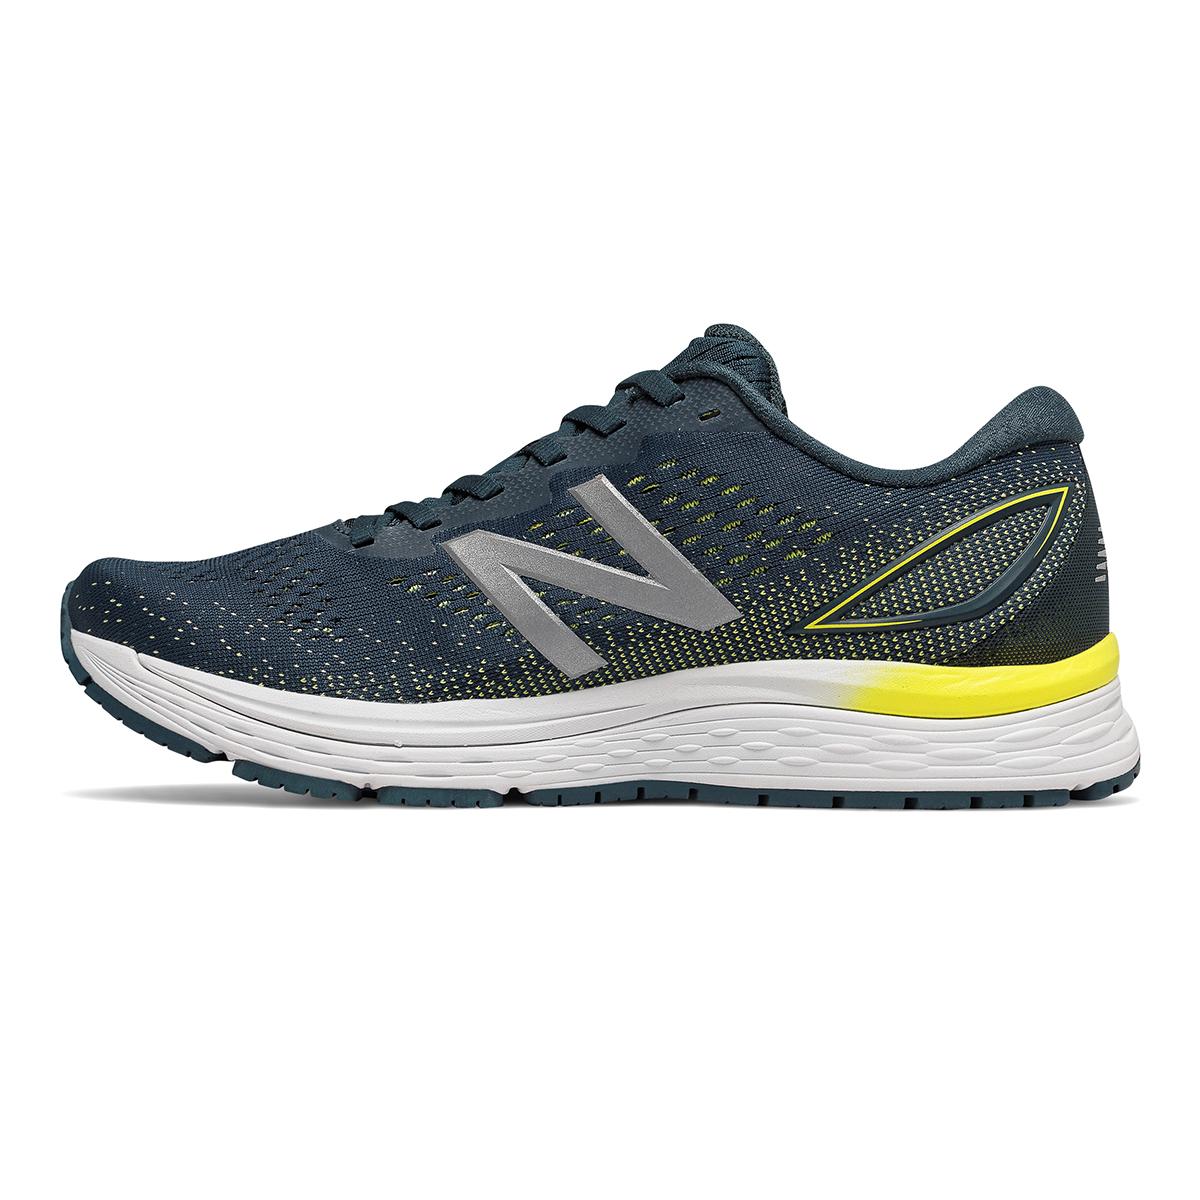 Men's New Balance 880V9 Running Shoe - Color: Supercell / Orion Blue / Sulphur Yellow (Regular Width) - Size: 8.5, Supercell / Orion Blue / Sulphur Yellow, large, image 2